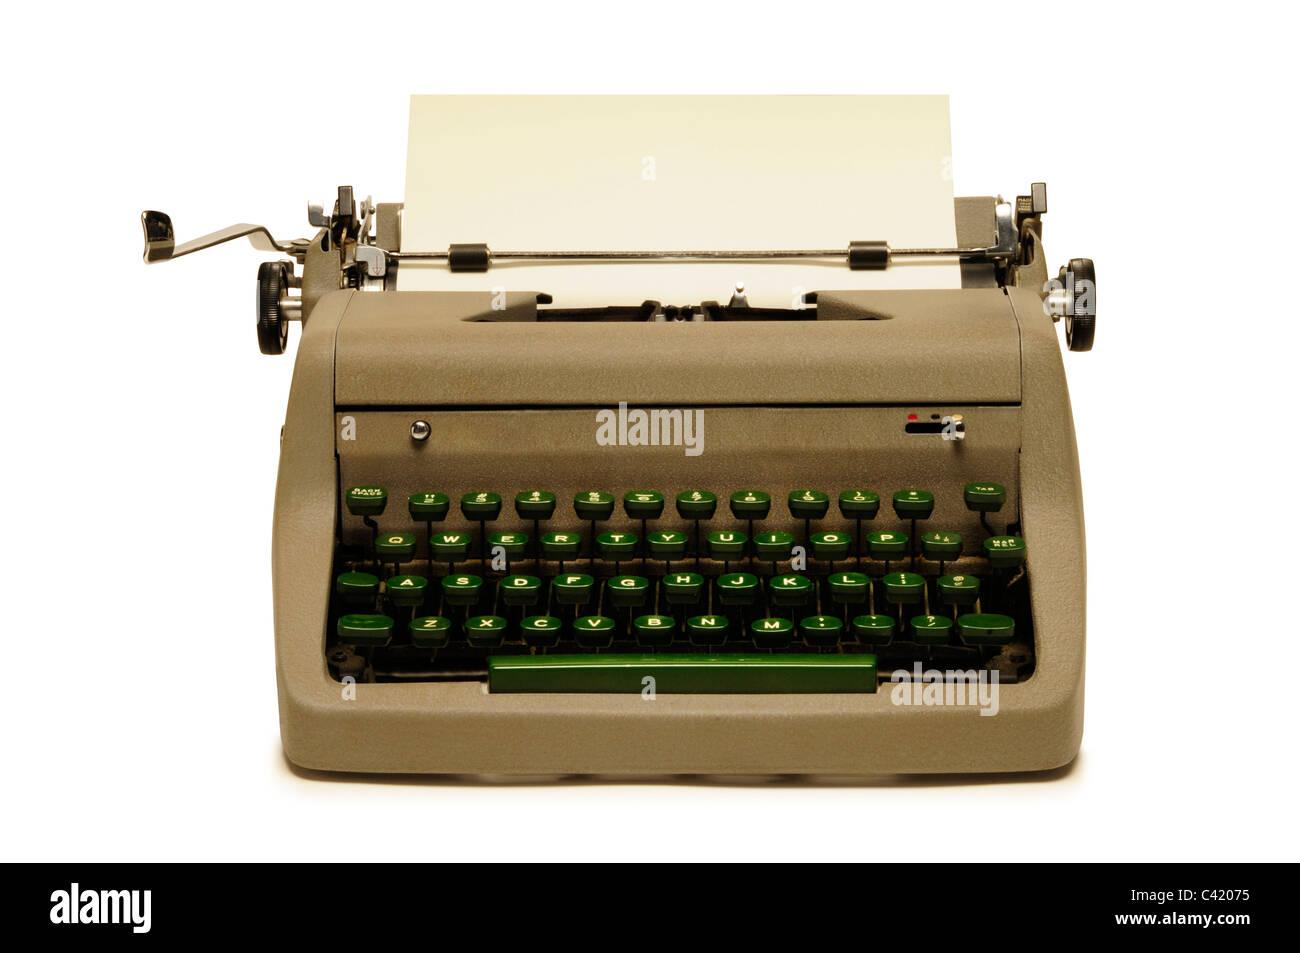 Vintage 1950s portable typewriter on white background - Stock Image